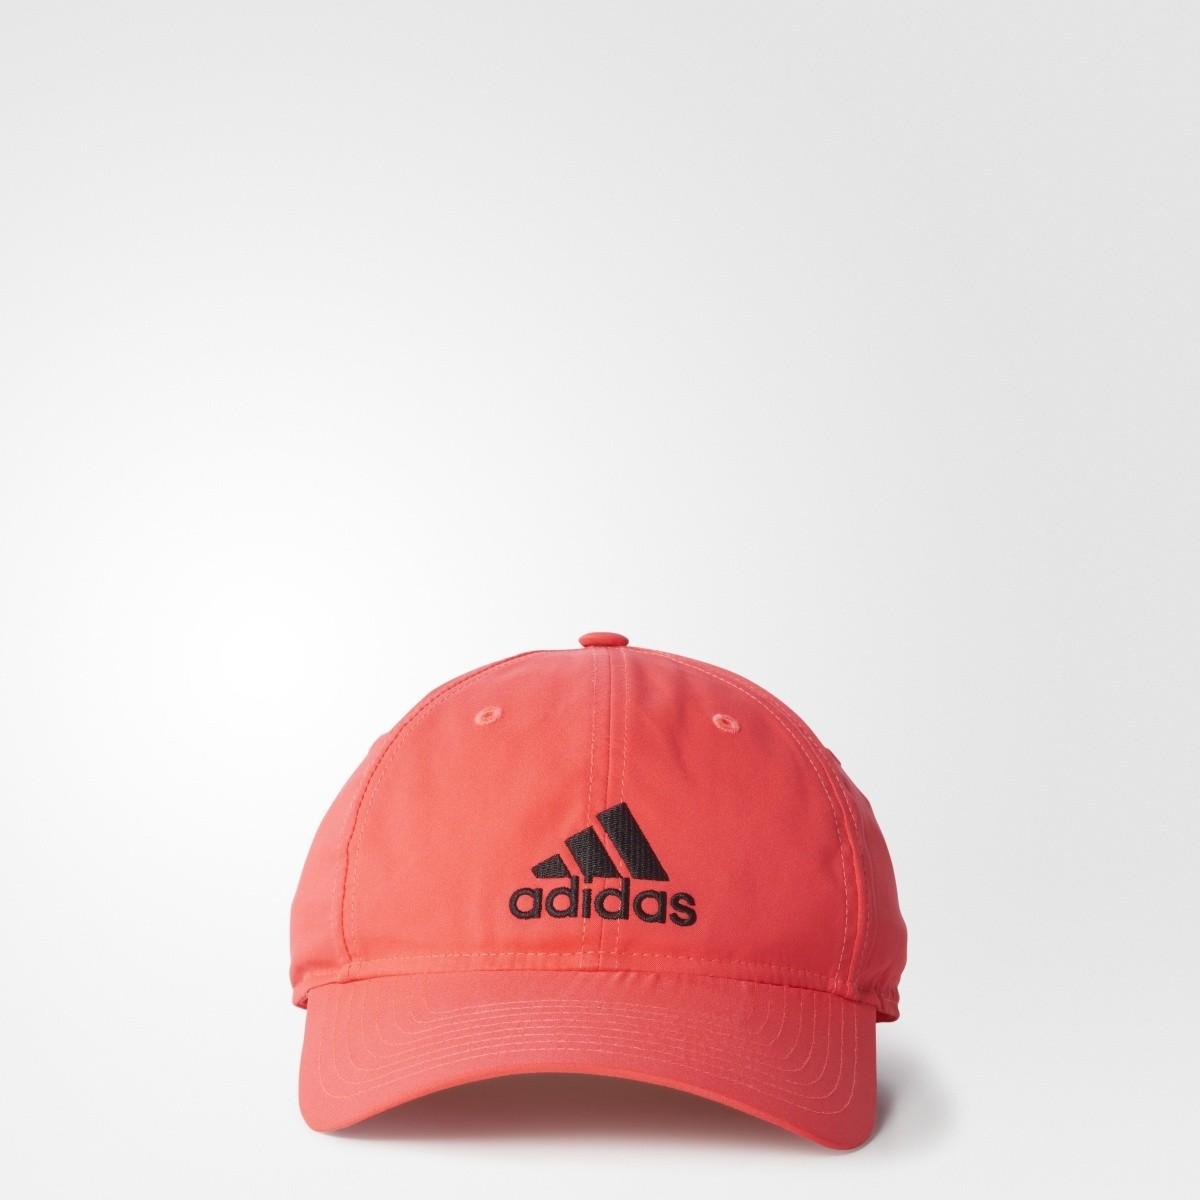 Pánská čepice adidas PERF CAP LOGO  25409e6be5cc